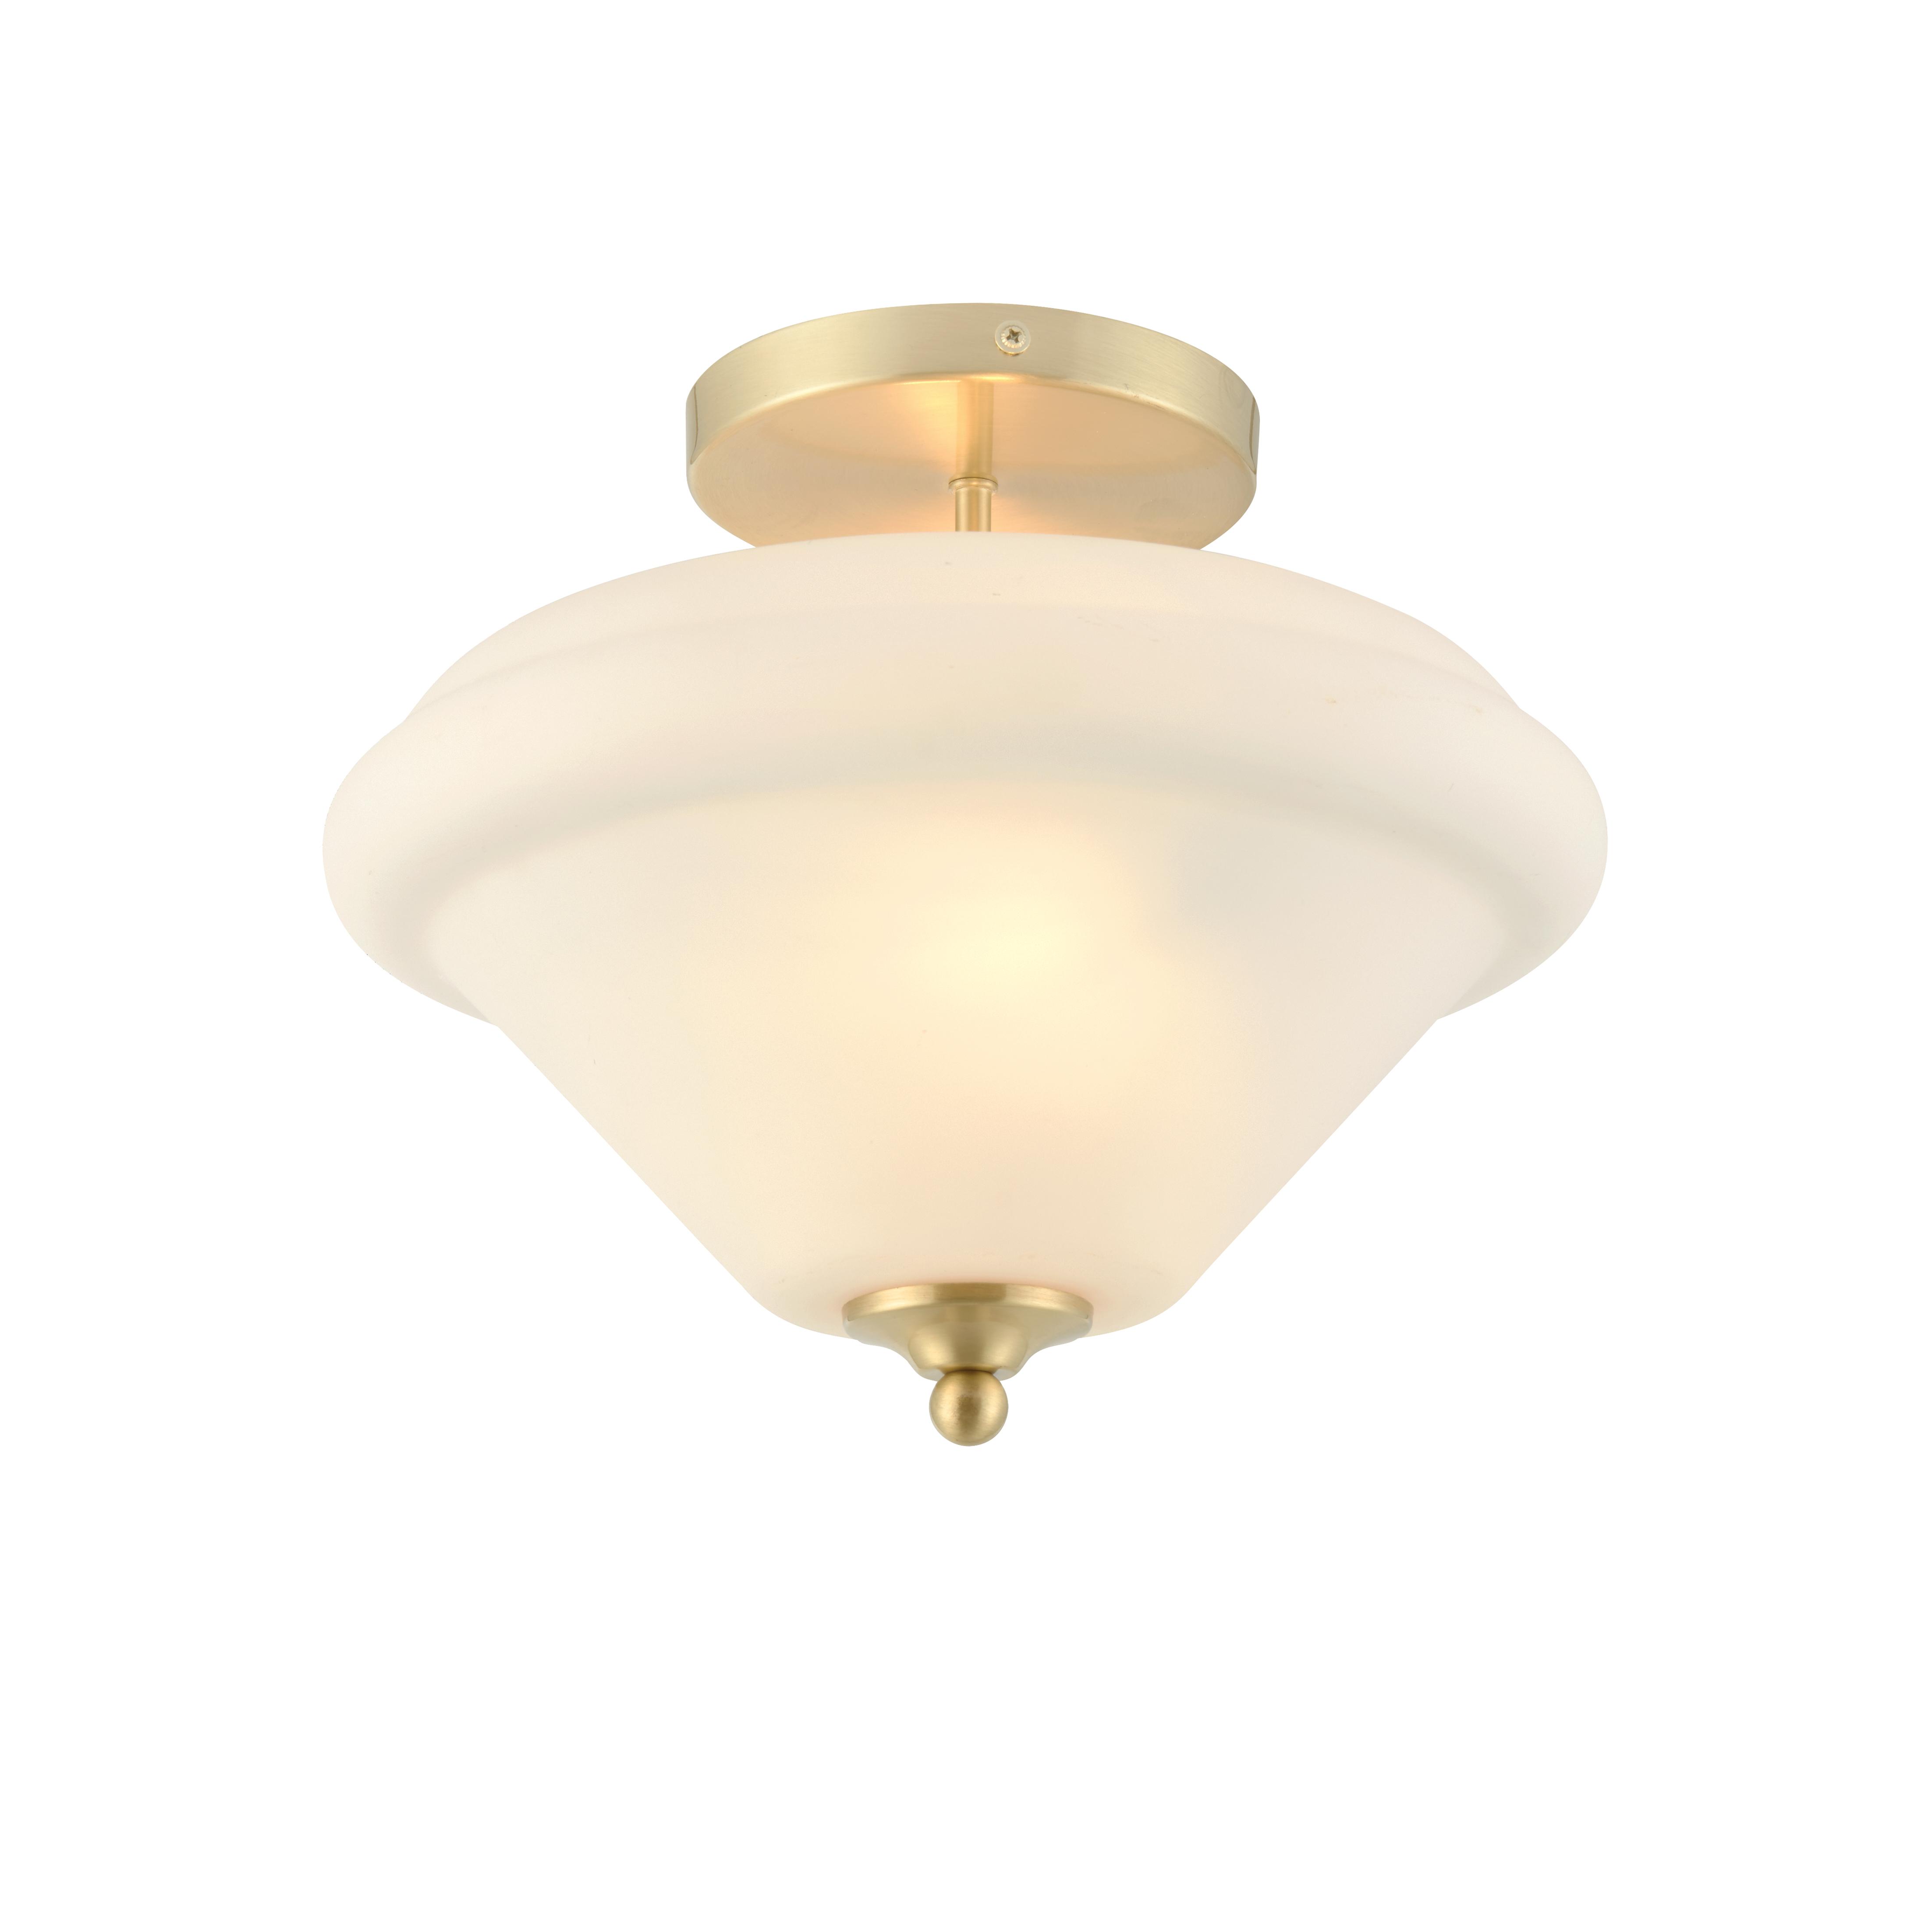 Endon 72790 Sicily Ceiling Light 2x40W